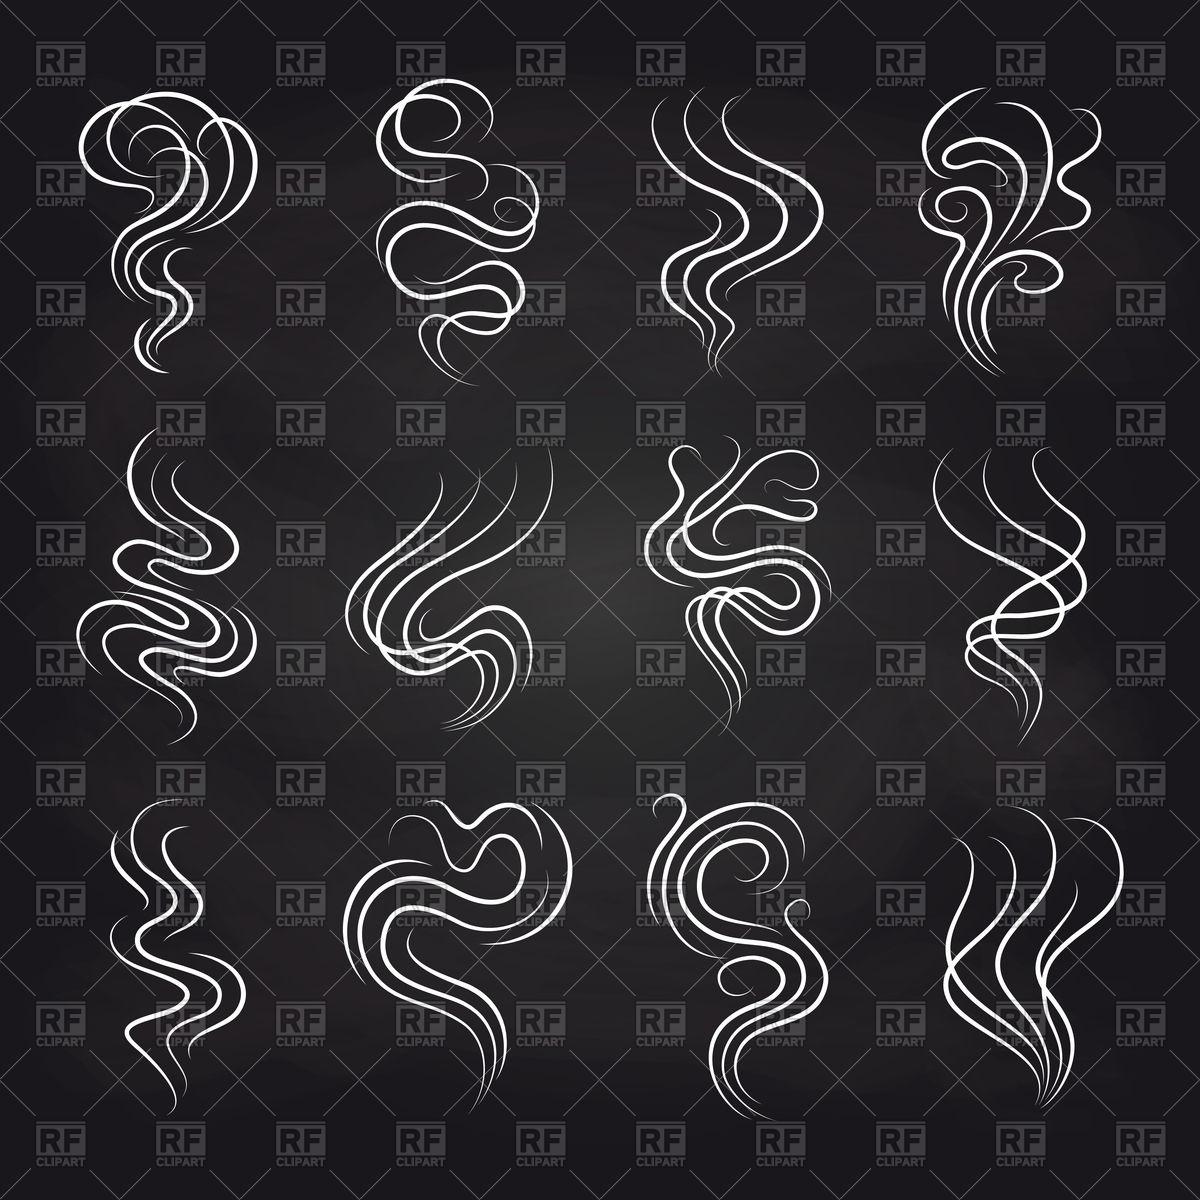 1200x1200 White Smoke Icons Set On Black Background Vector Image Vector